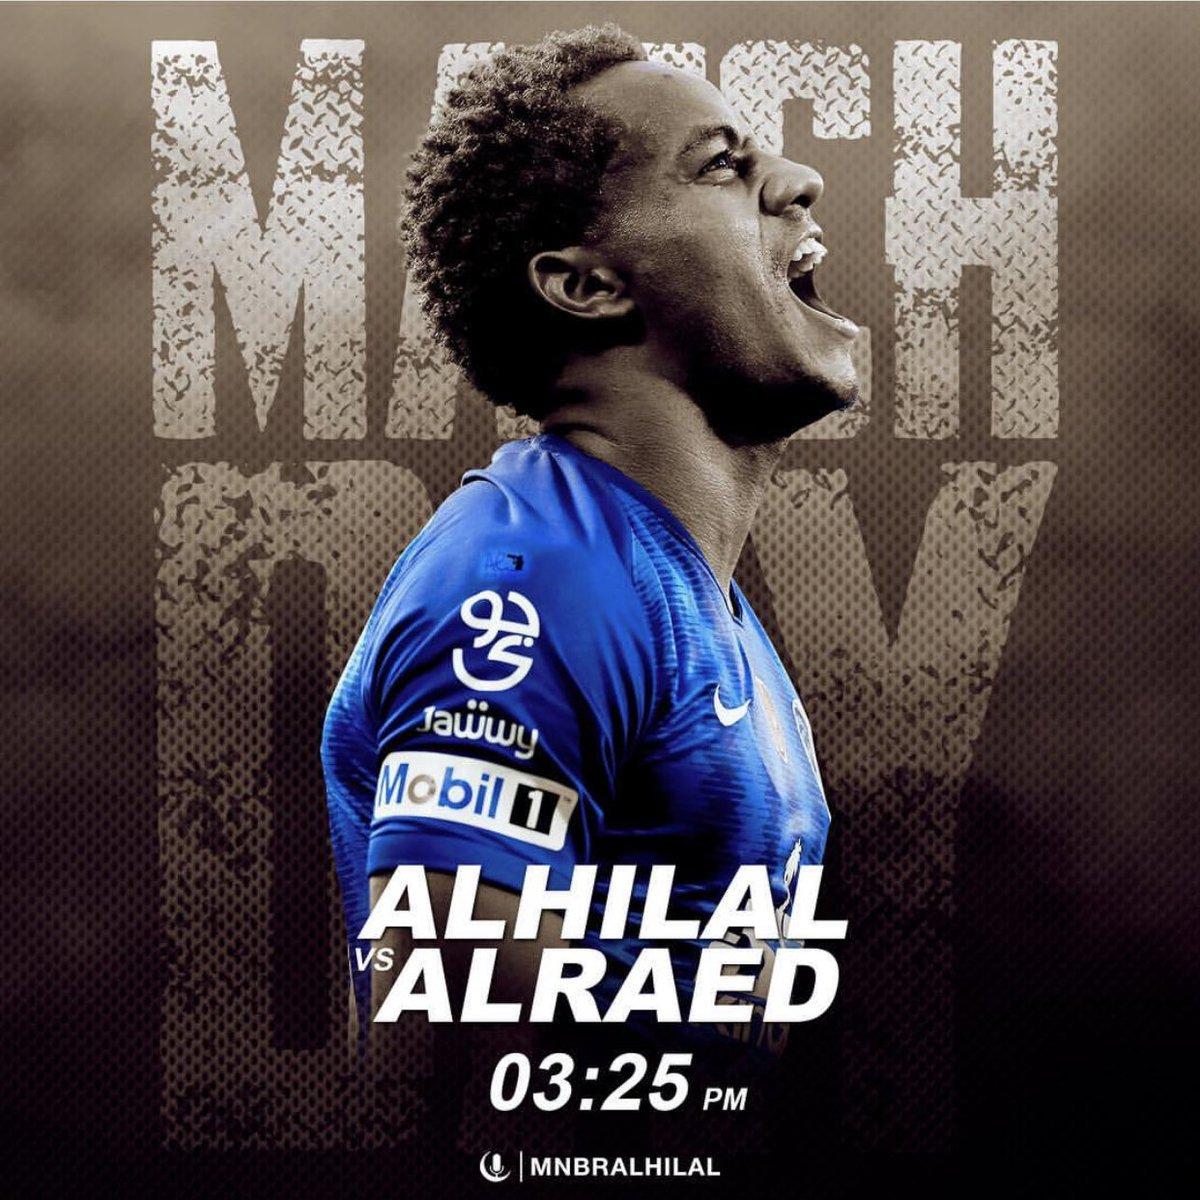 watch Online  Bin  SPORT HD 1   #الهلال_الرايدَ  LINK 1:  http:// is.gd/KXs1nT  &nbsp;    LINK 2 :  http:// is.gd/KXs1nT  &nbsp;  <br>http://pic.twitter.com/D9zT0RWiBl